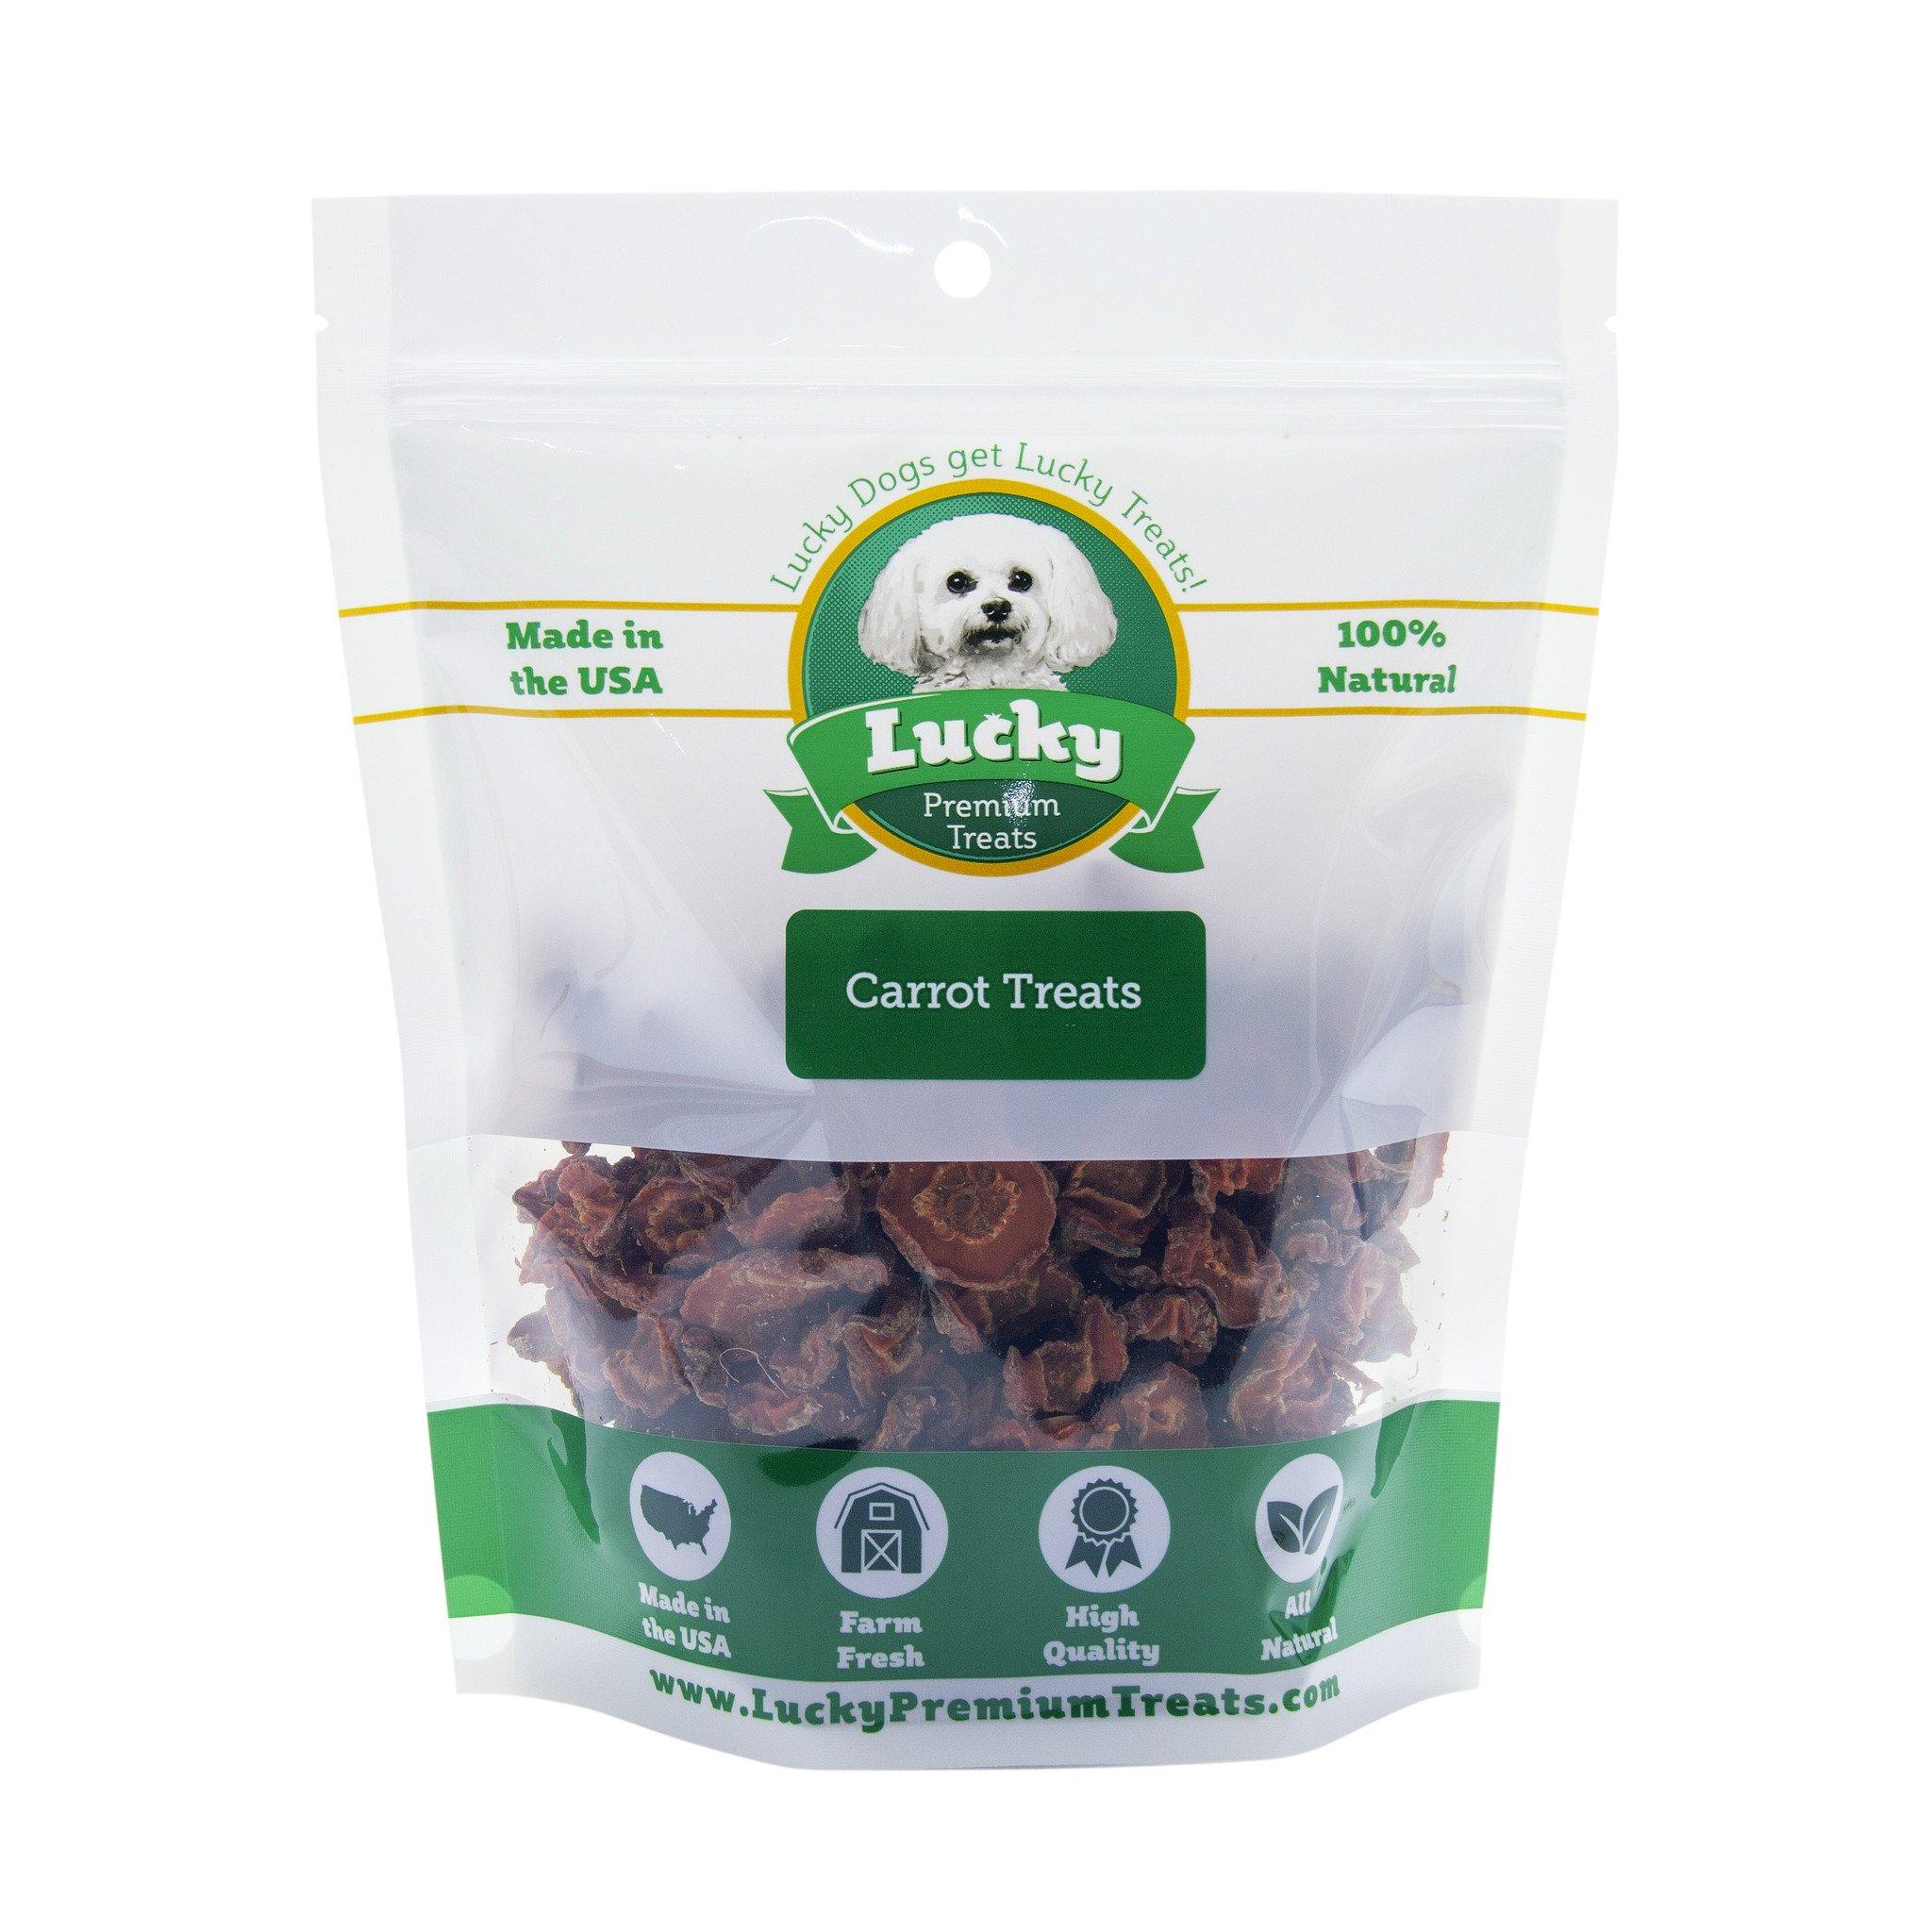 Carrot Medallion Dog Treats - Dehydrated Carrots Sliced into Medallions - Farm Fresh and Made in the USA Treats by Lucky Premium Treats